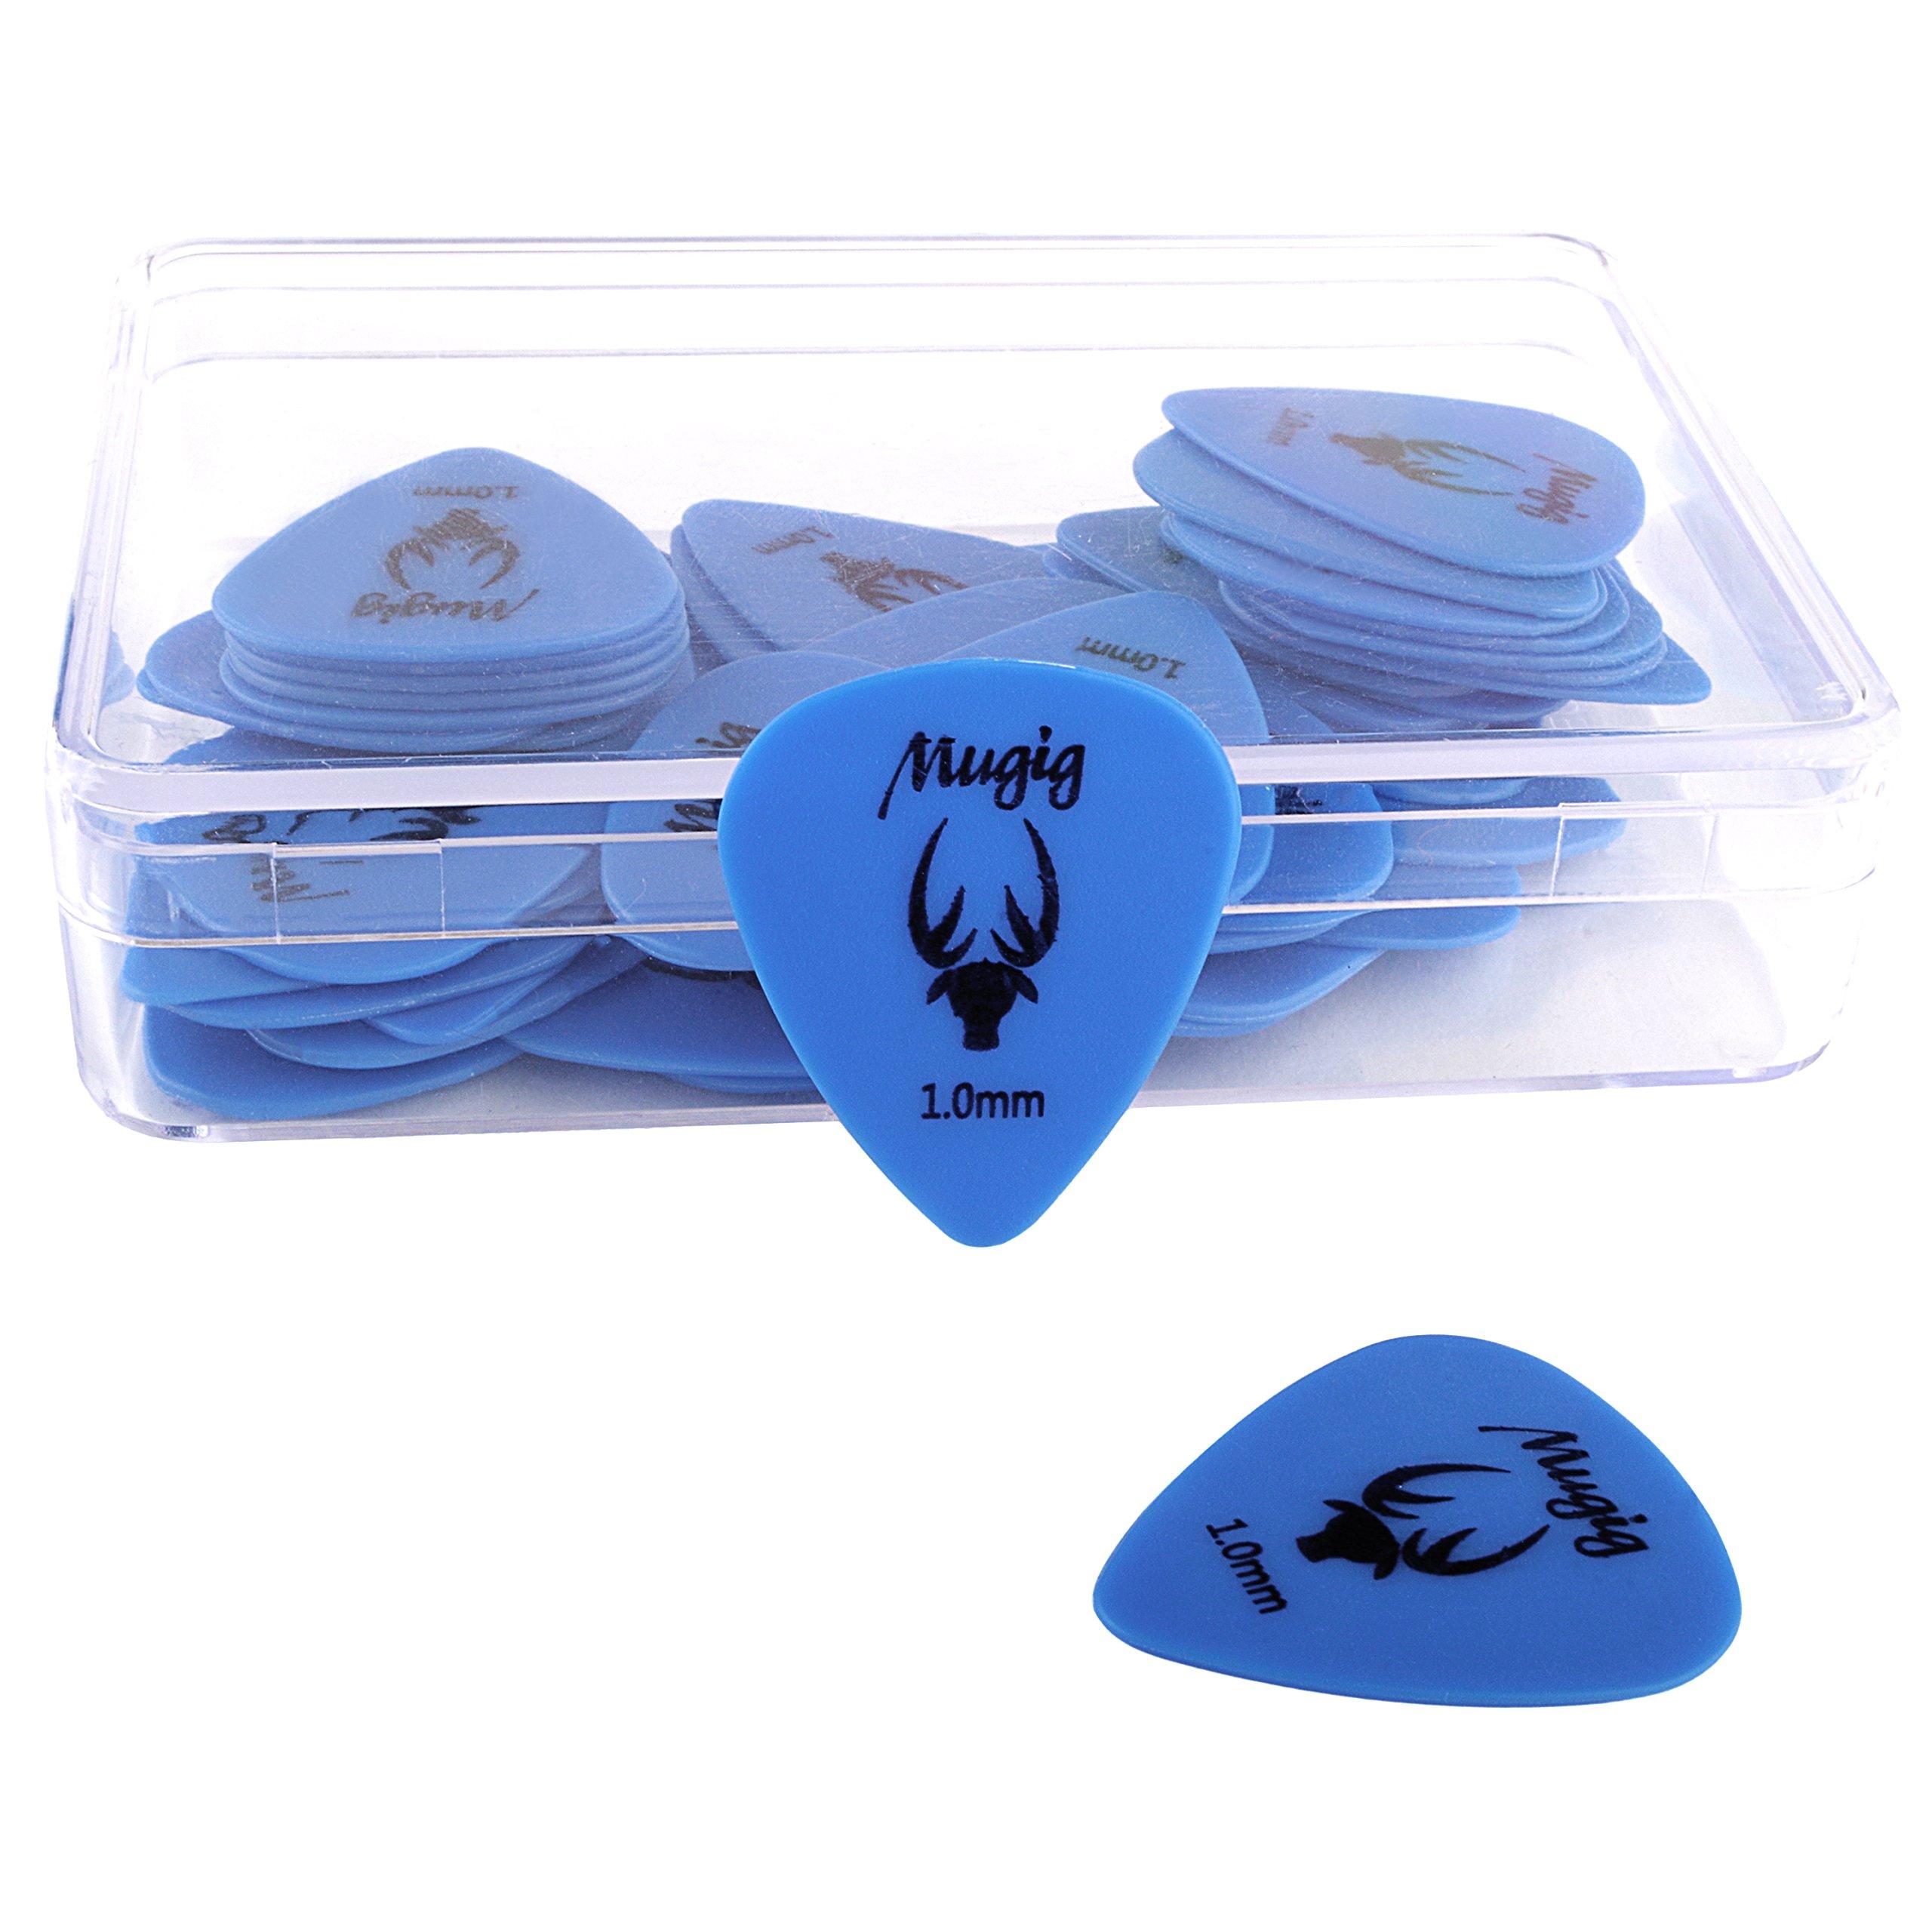 Mugig Guitar Picks Plectrums Delrin Acetal Resin (1.0mm)